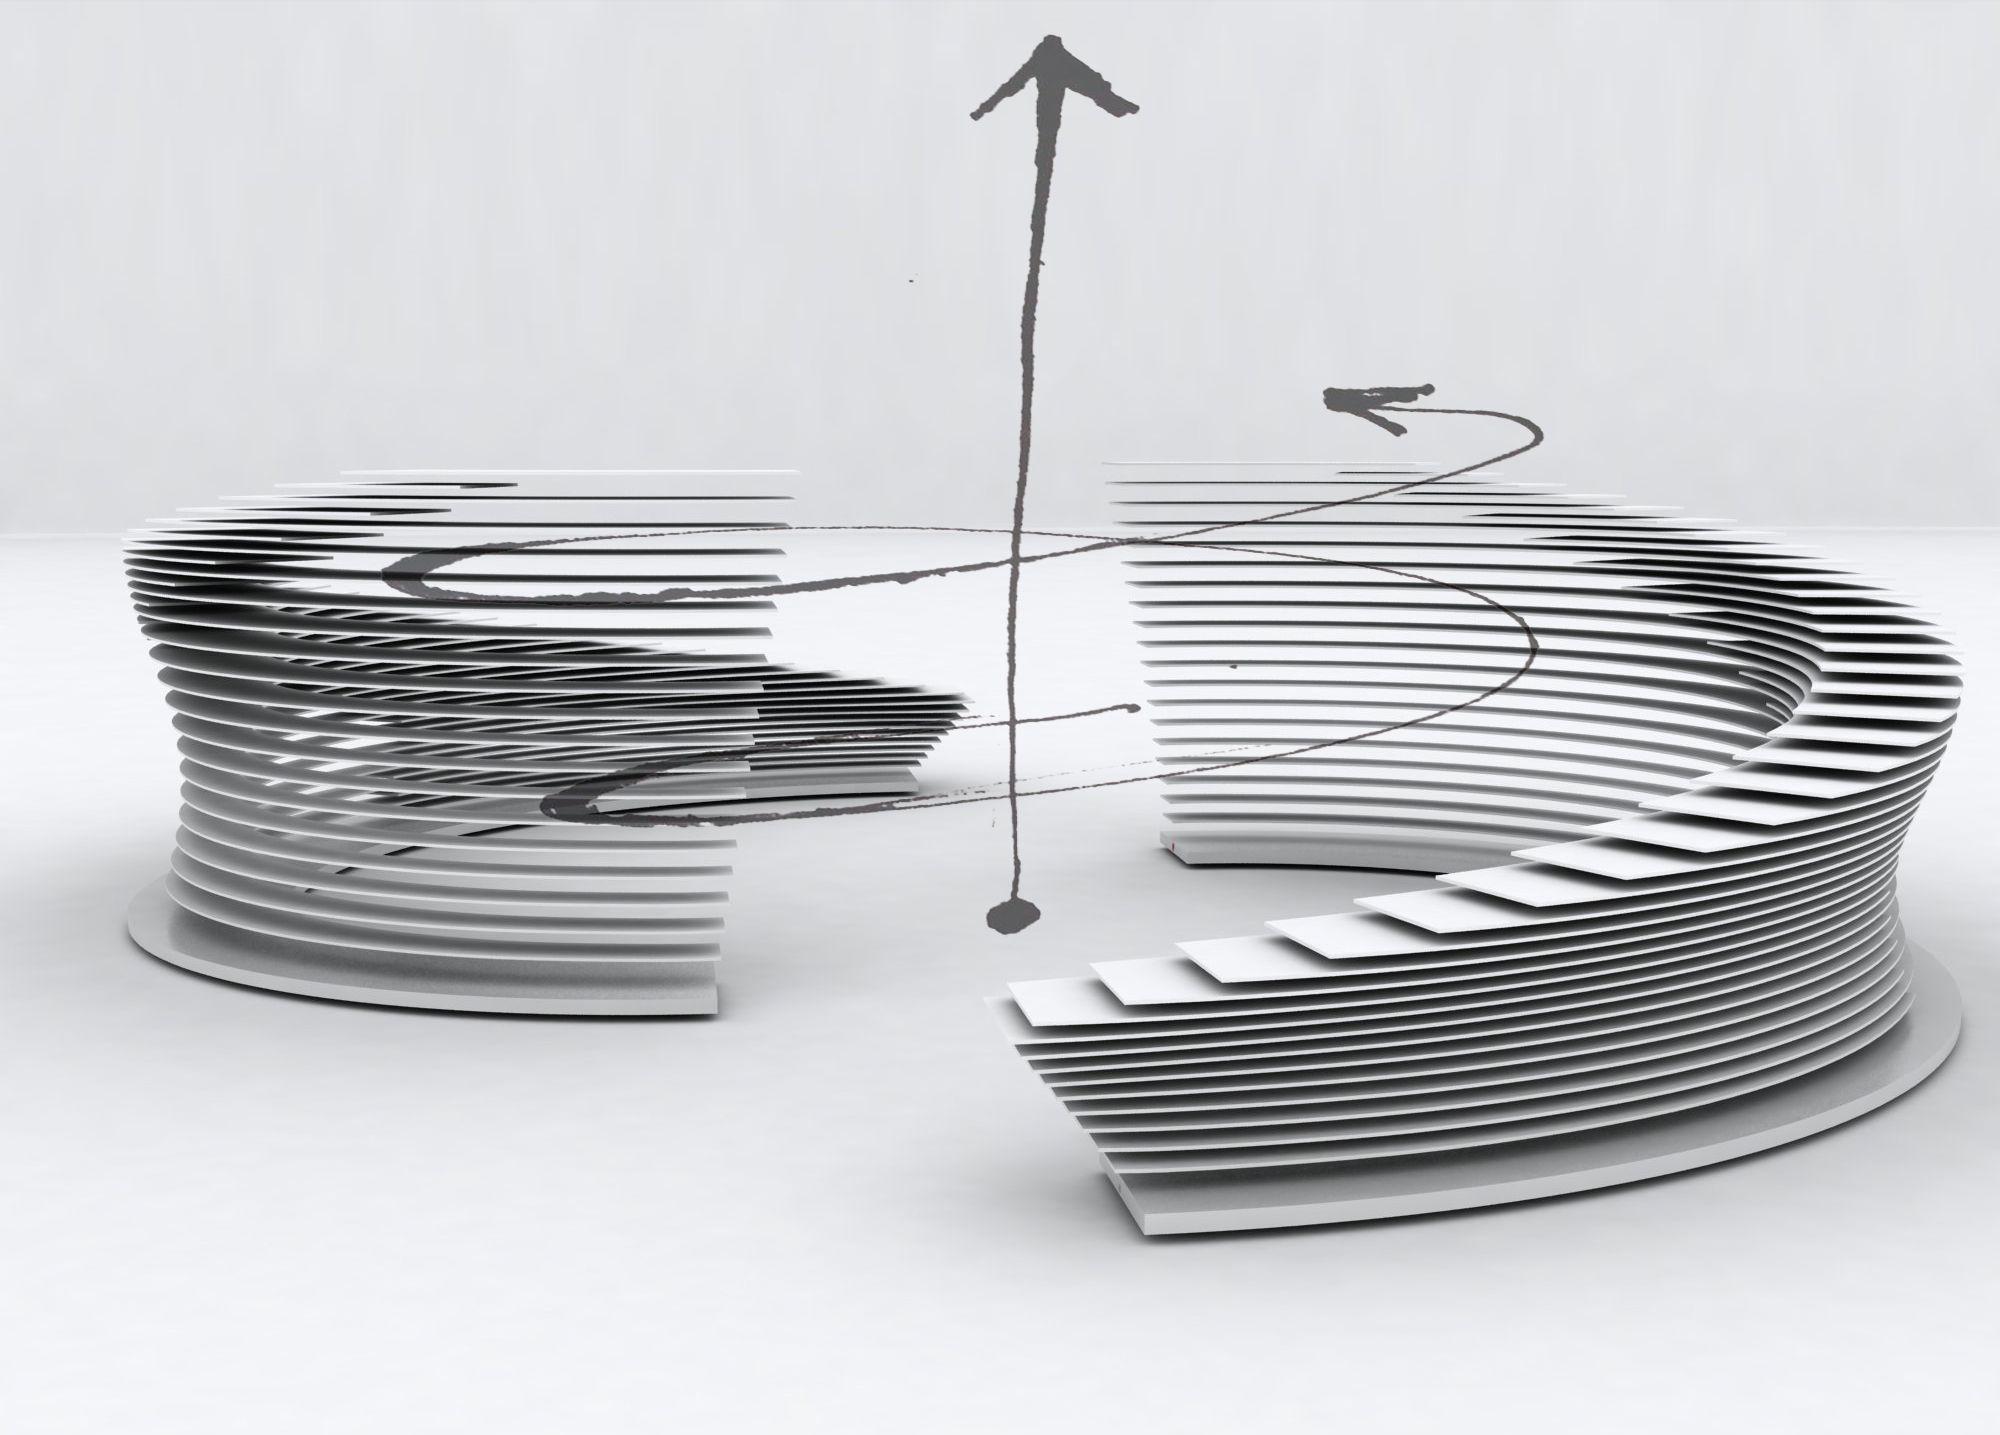 Arturo Tedeschi · NU:S Parametric Installation · Divisare